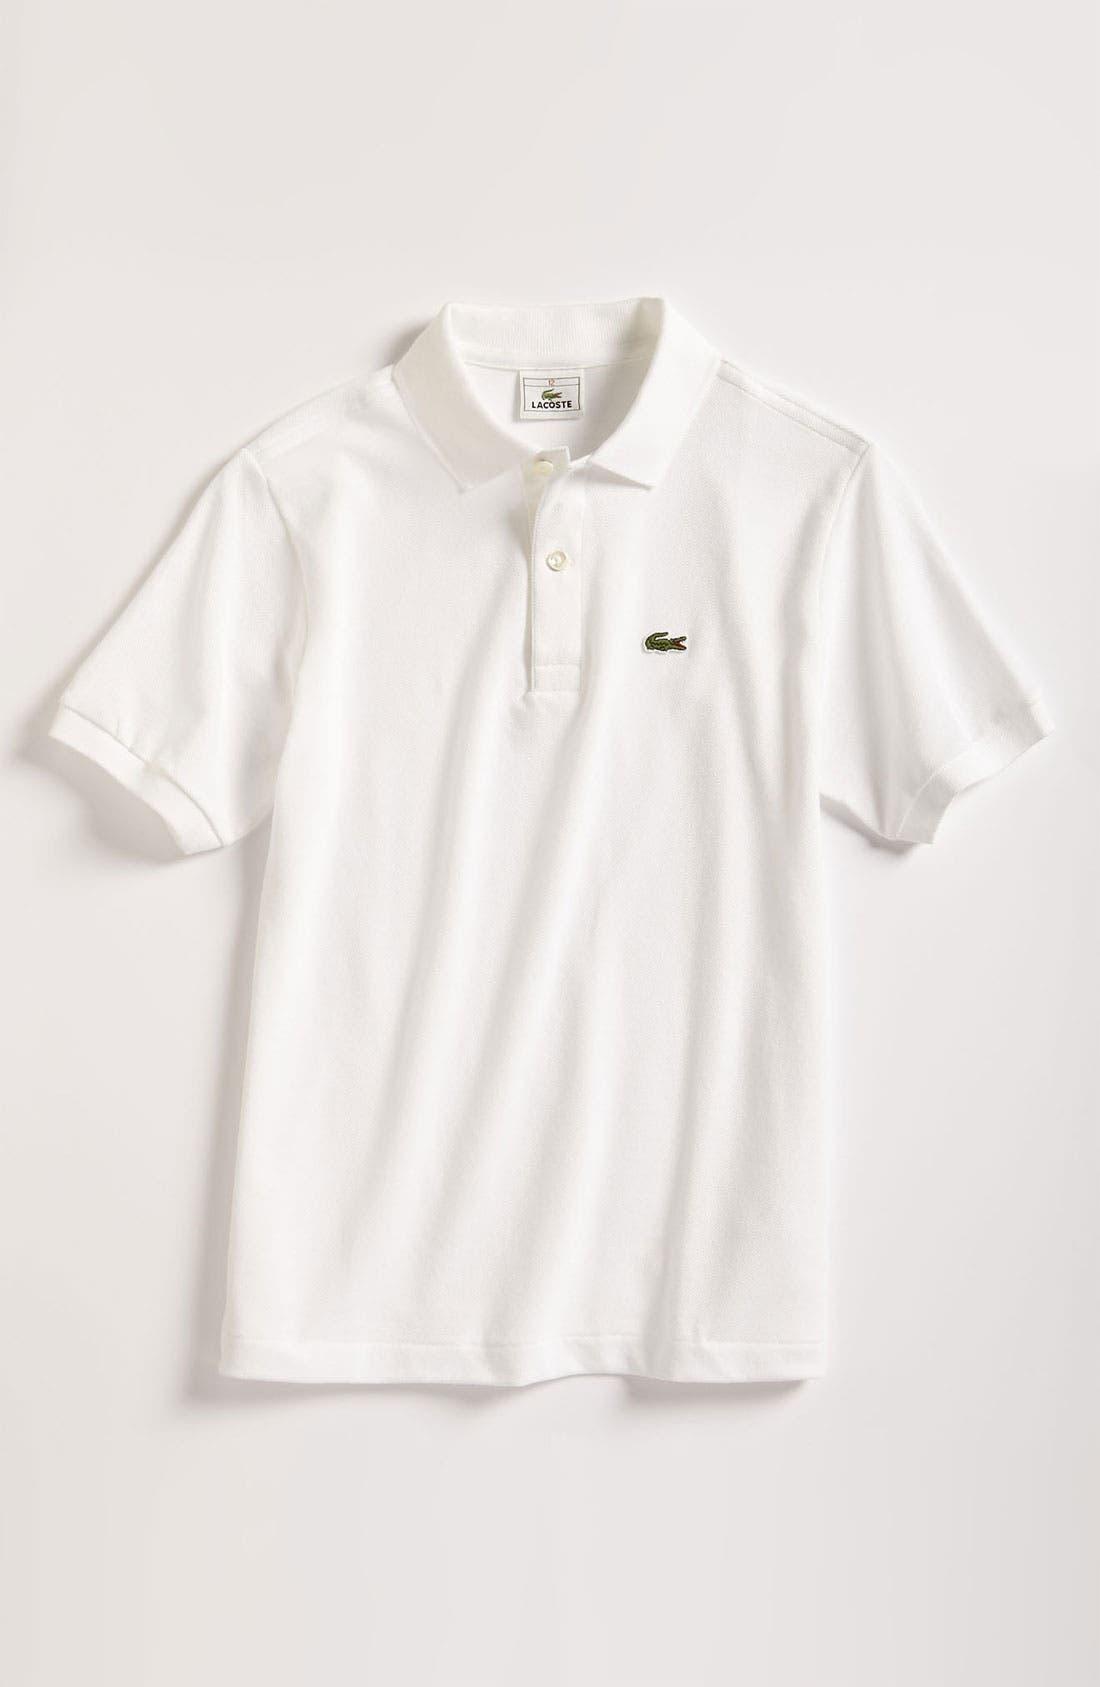 LACOSTE,                             Short Sleeve Piqué Polo,                             Main thumbnail 1, color,                             WHITE